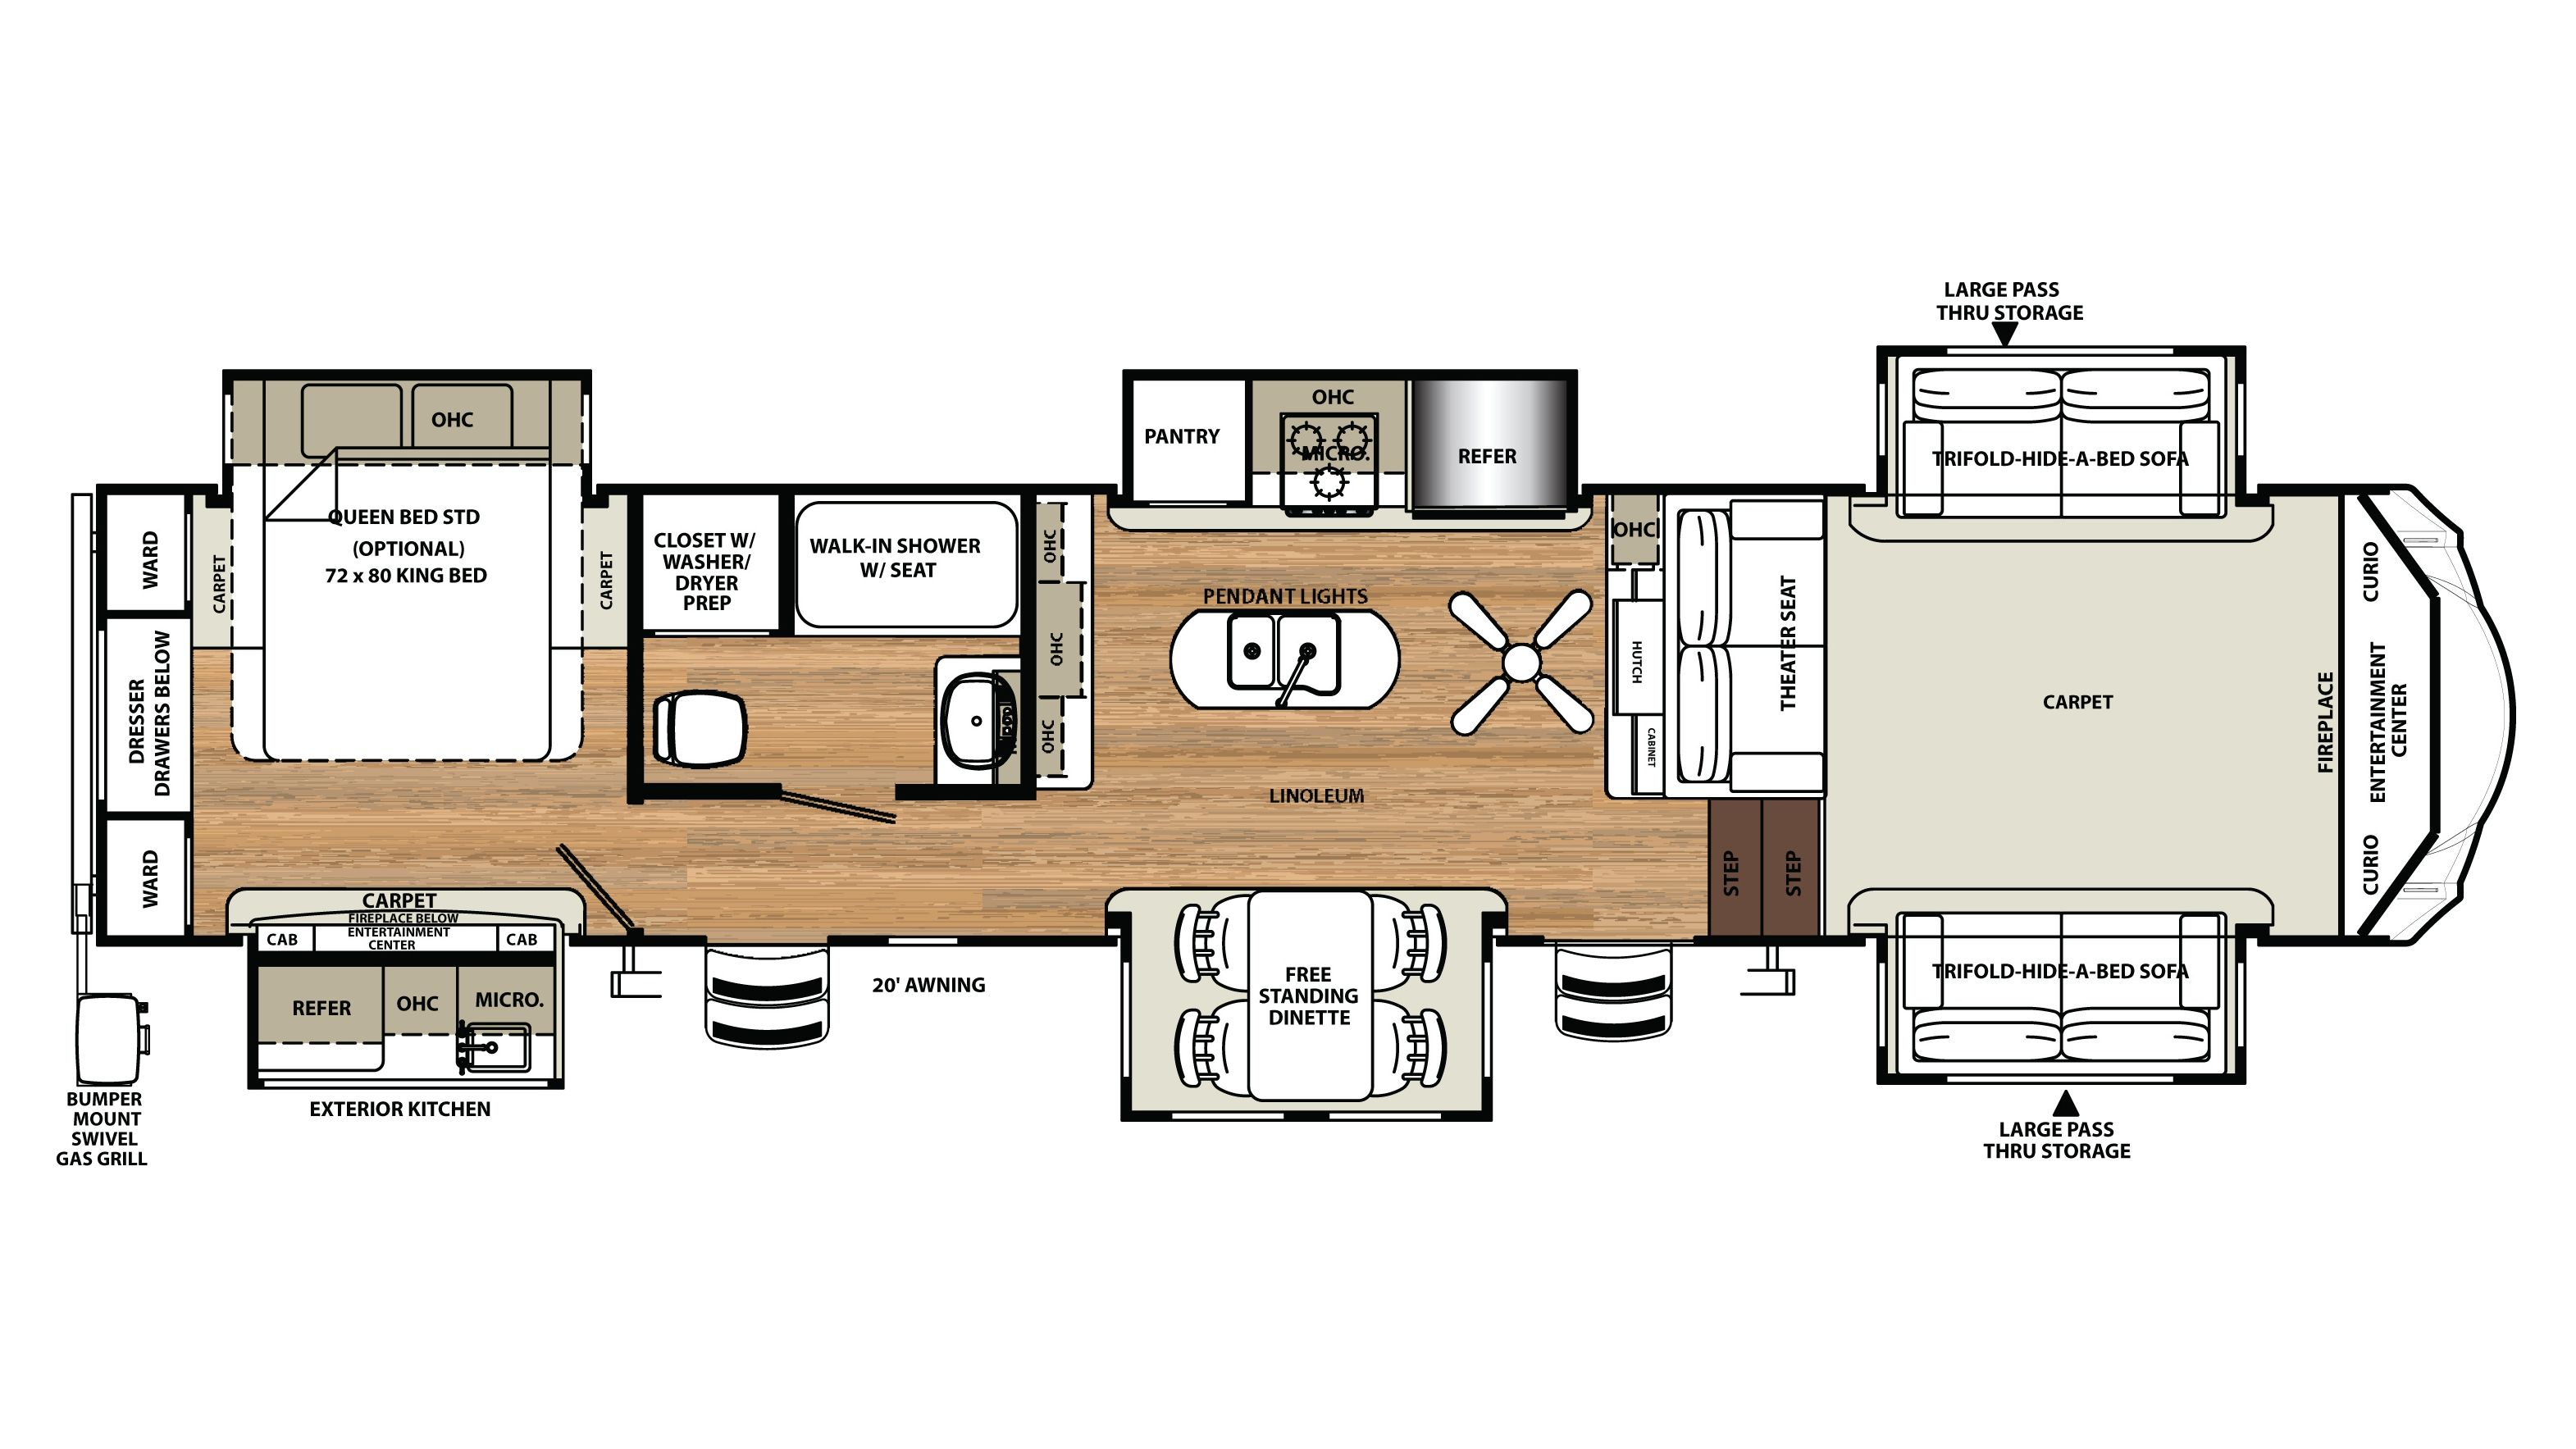 Sandpiper 5th Wheel Rv Floor Plans  2eb27fdb3